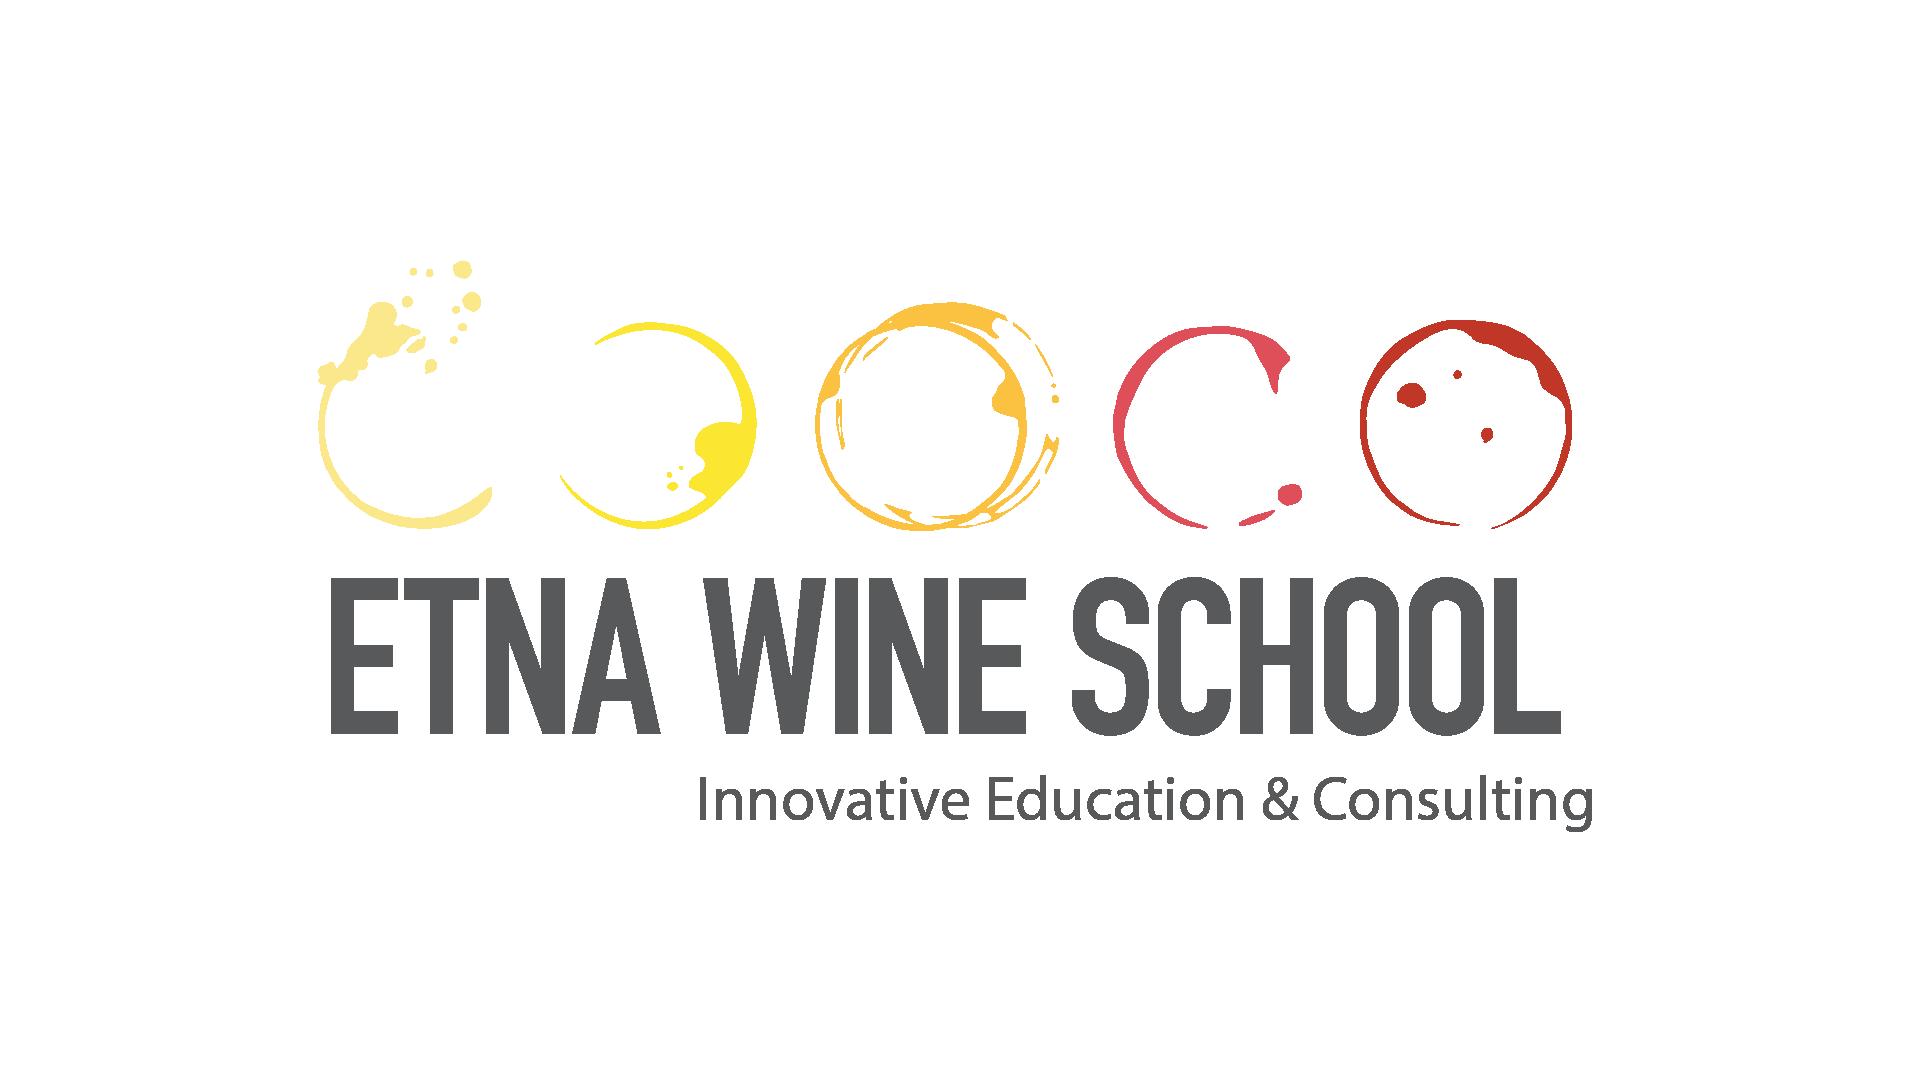 EtnaWineSchool_Logo_Slide1.png